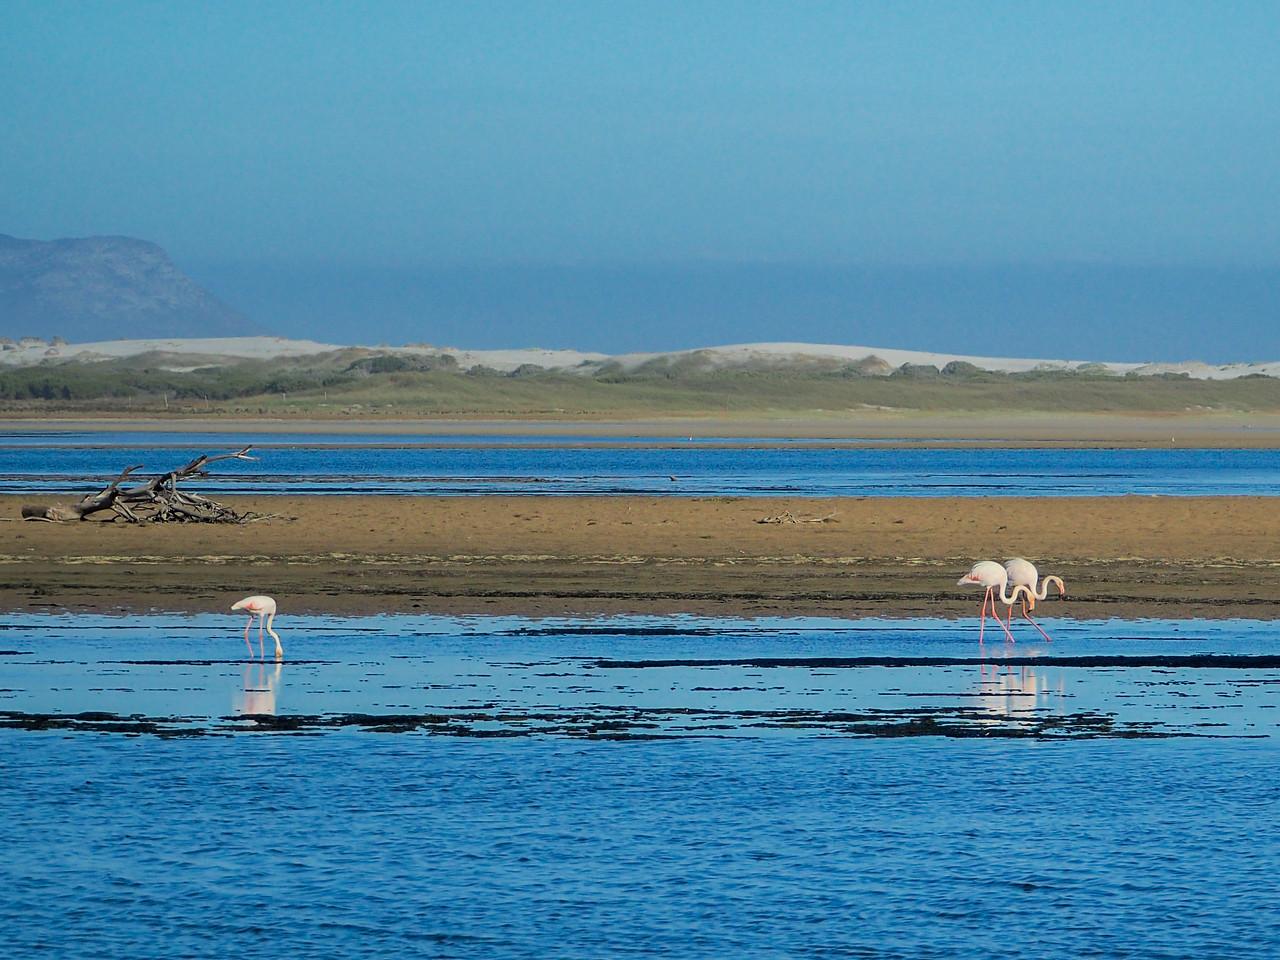 Flamingos near Gansbaai, South Africa